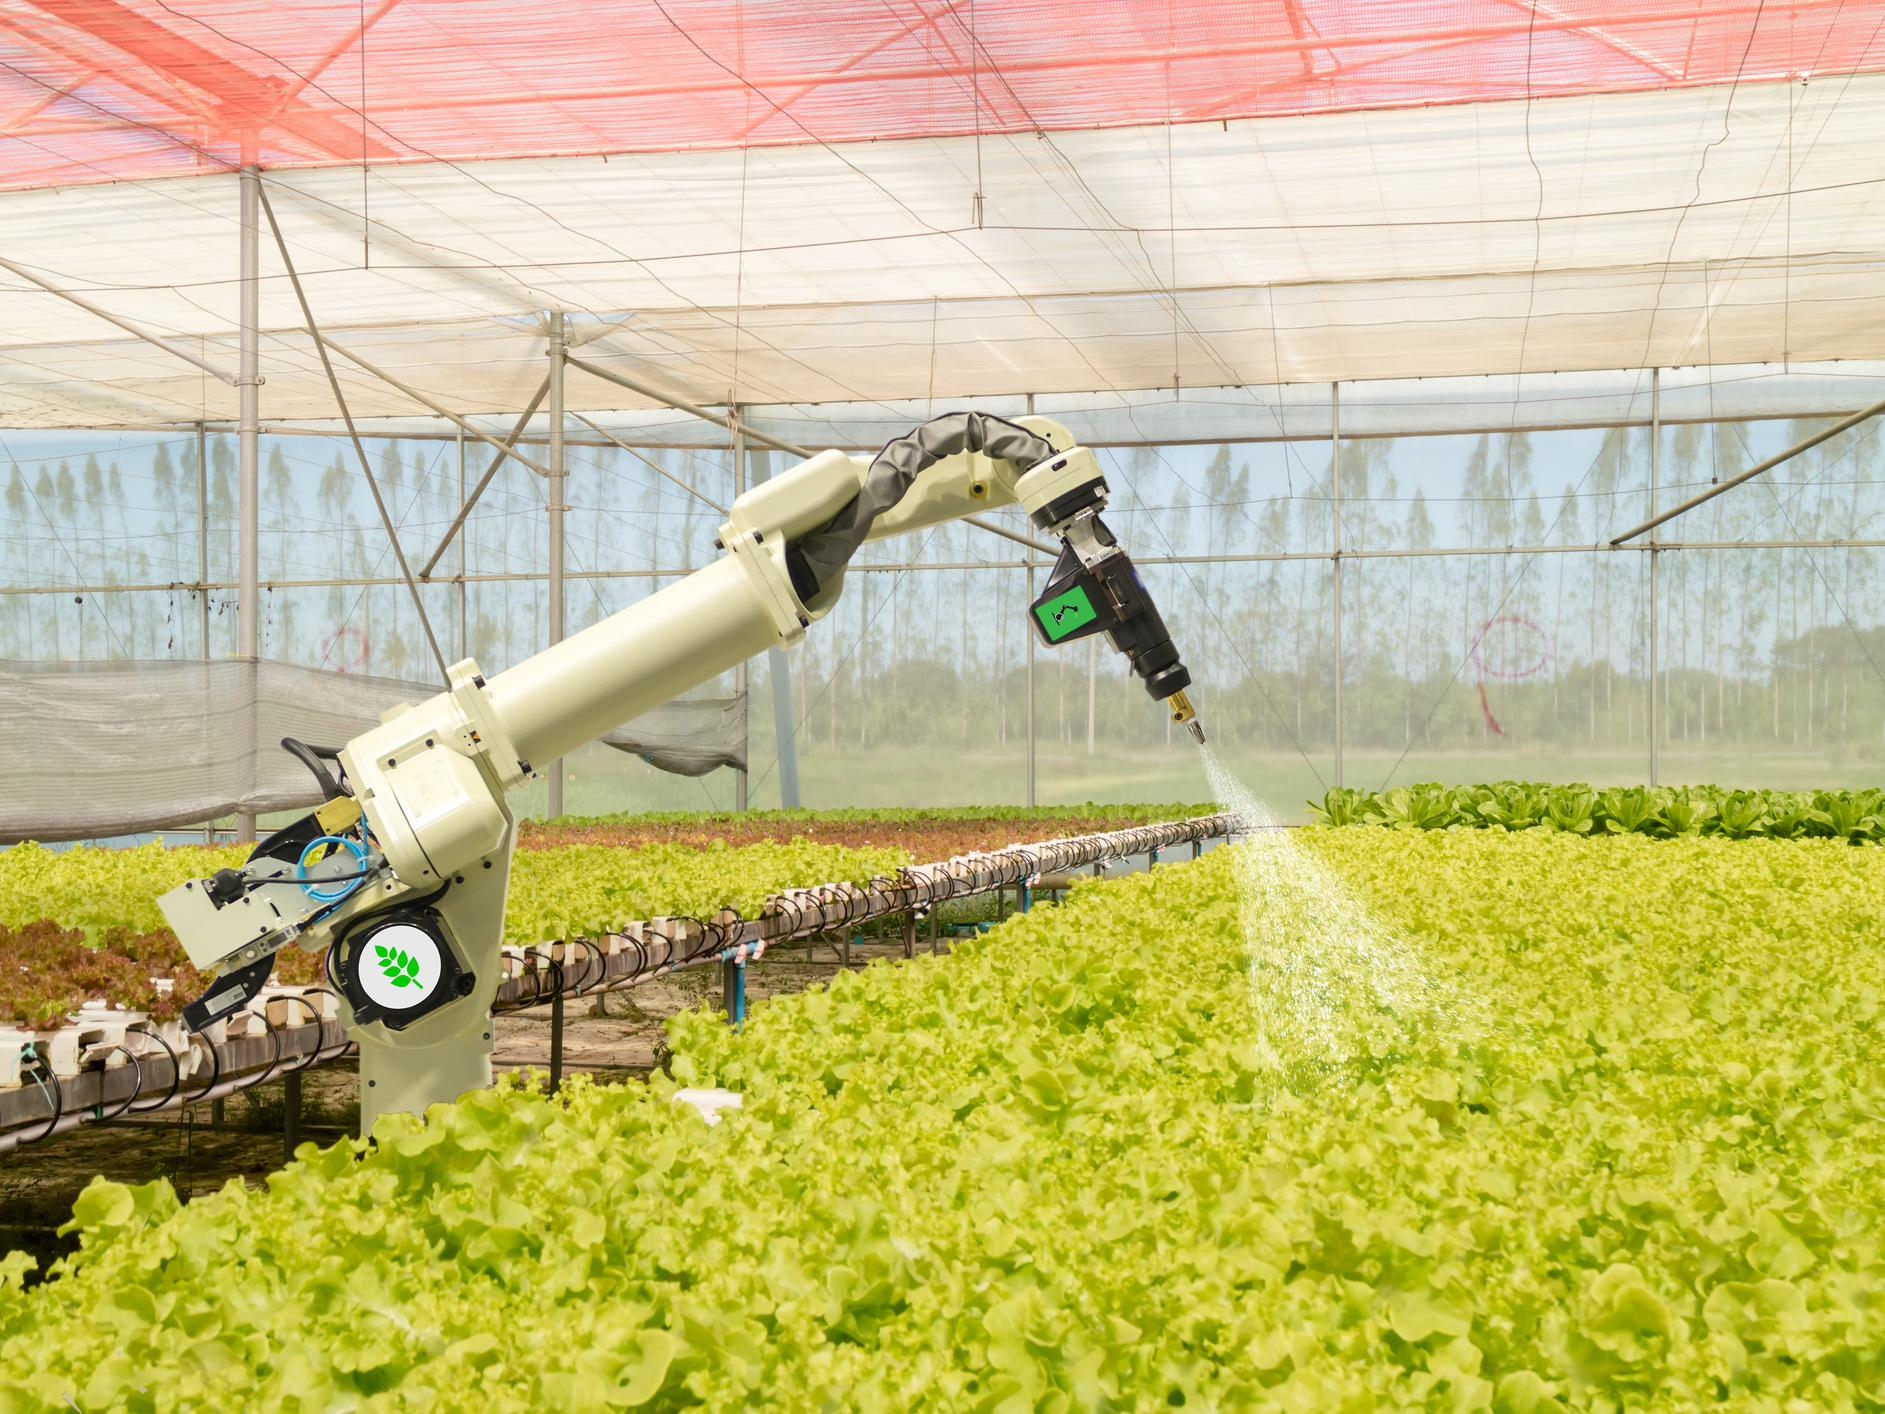 SRC using AI to nutrient plants efficiently (Source : SRC)